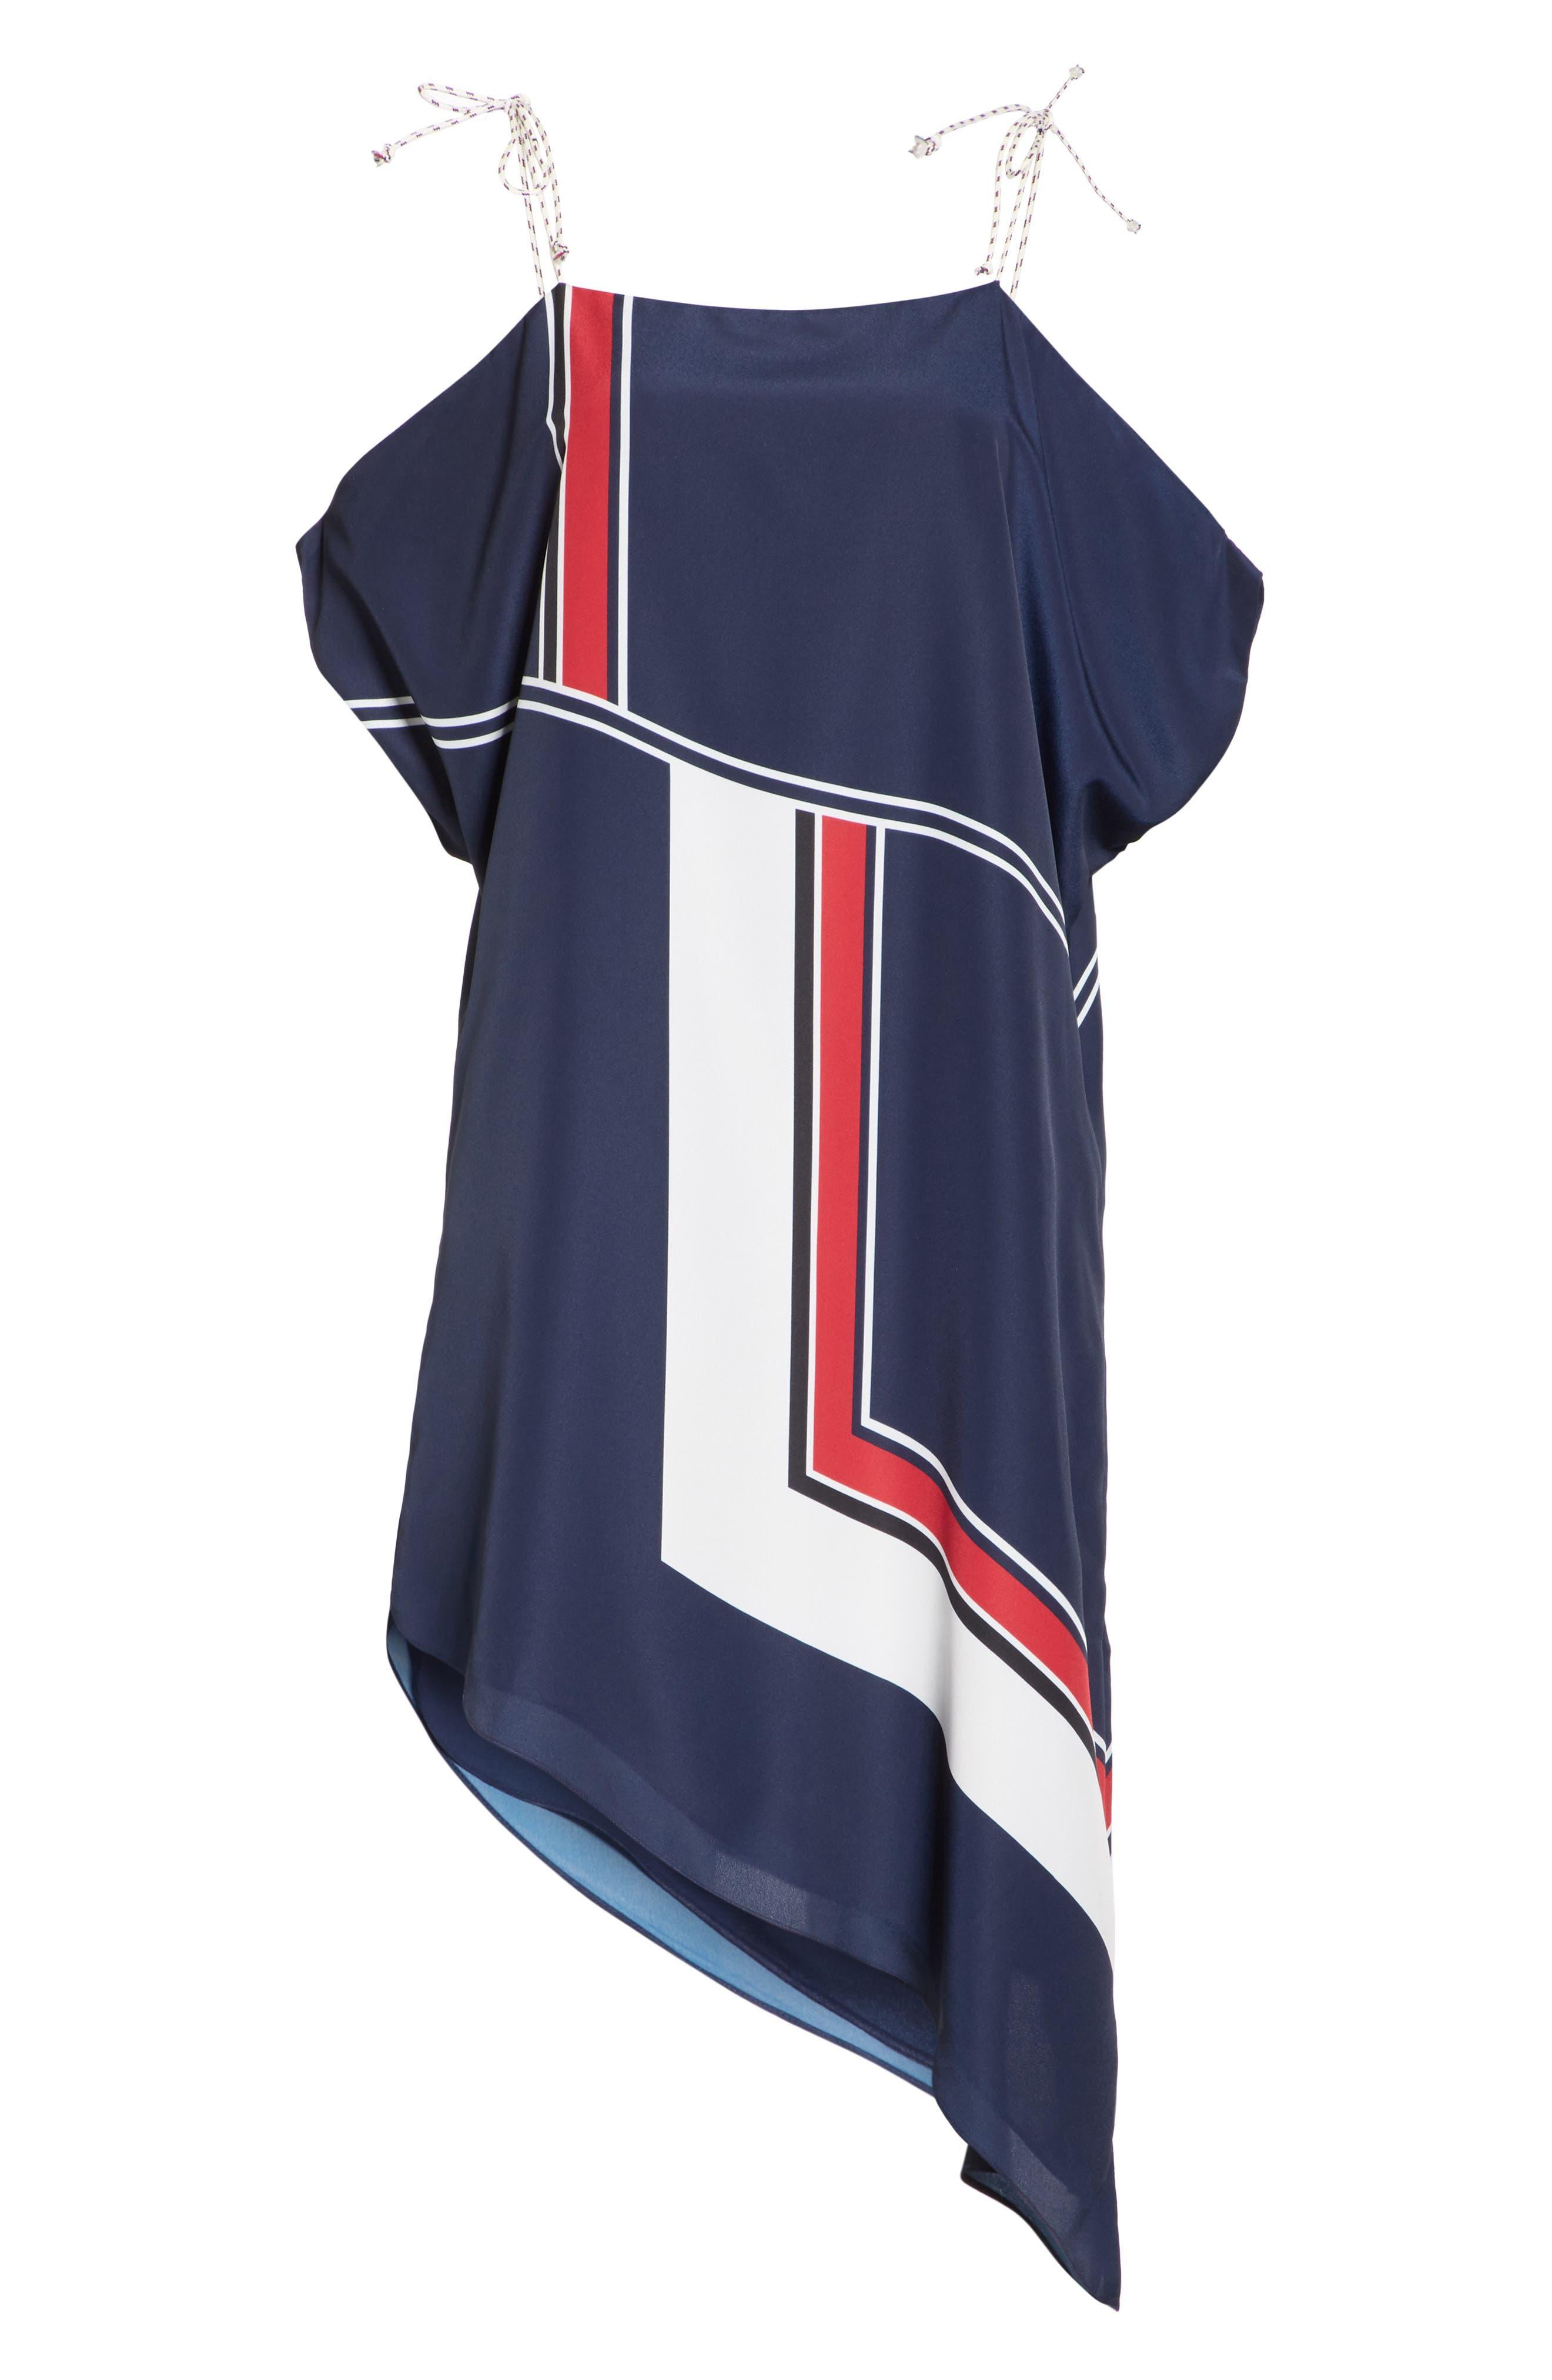 Edyte Asymmetrical Dress,                             Alternate thumbnail 6, color,                             Dark Navy